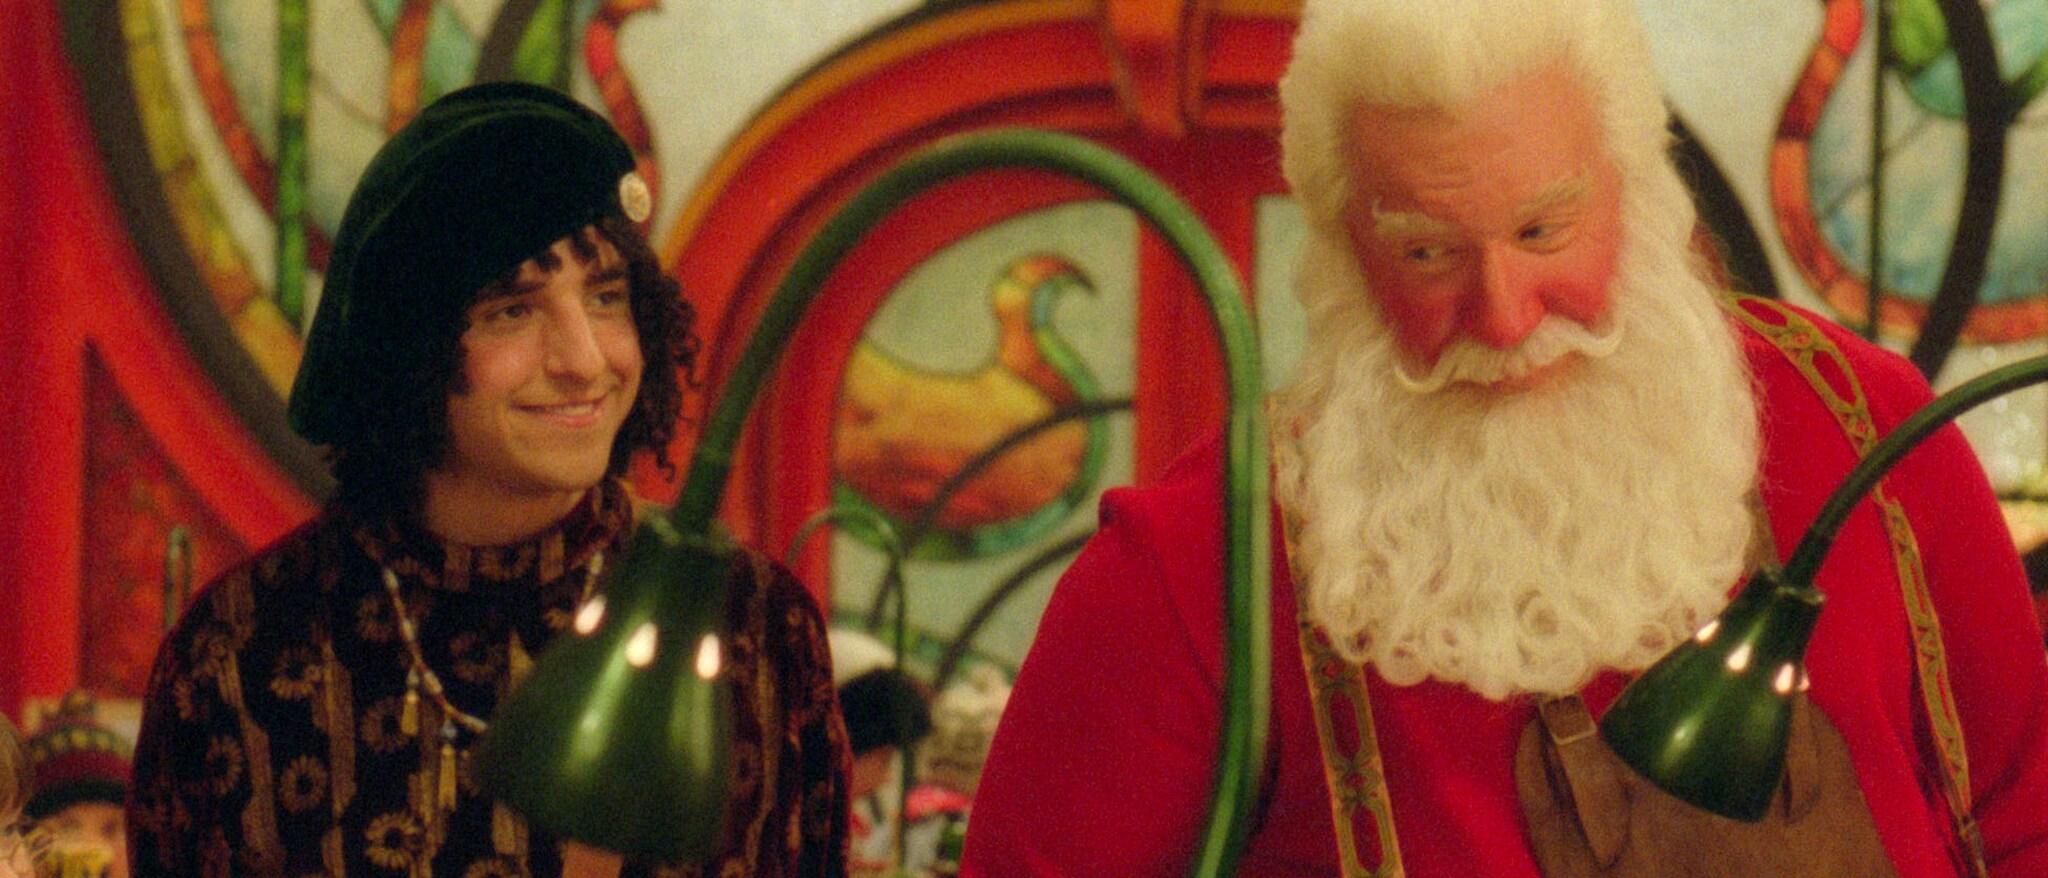 The Santa Clause 2 Hero